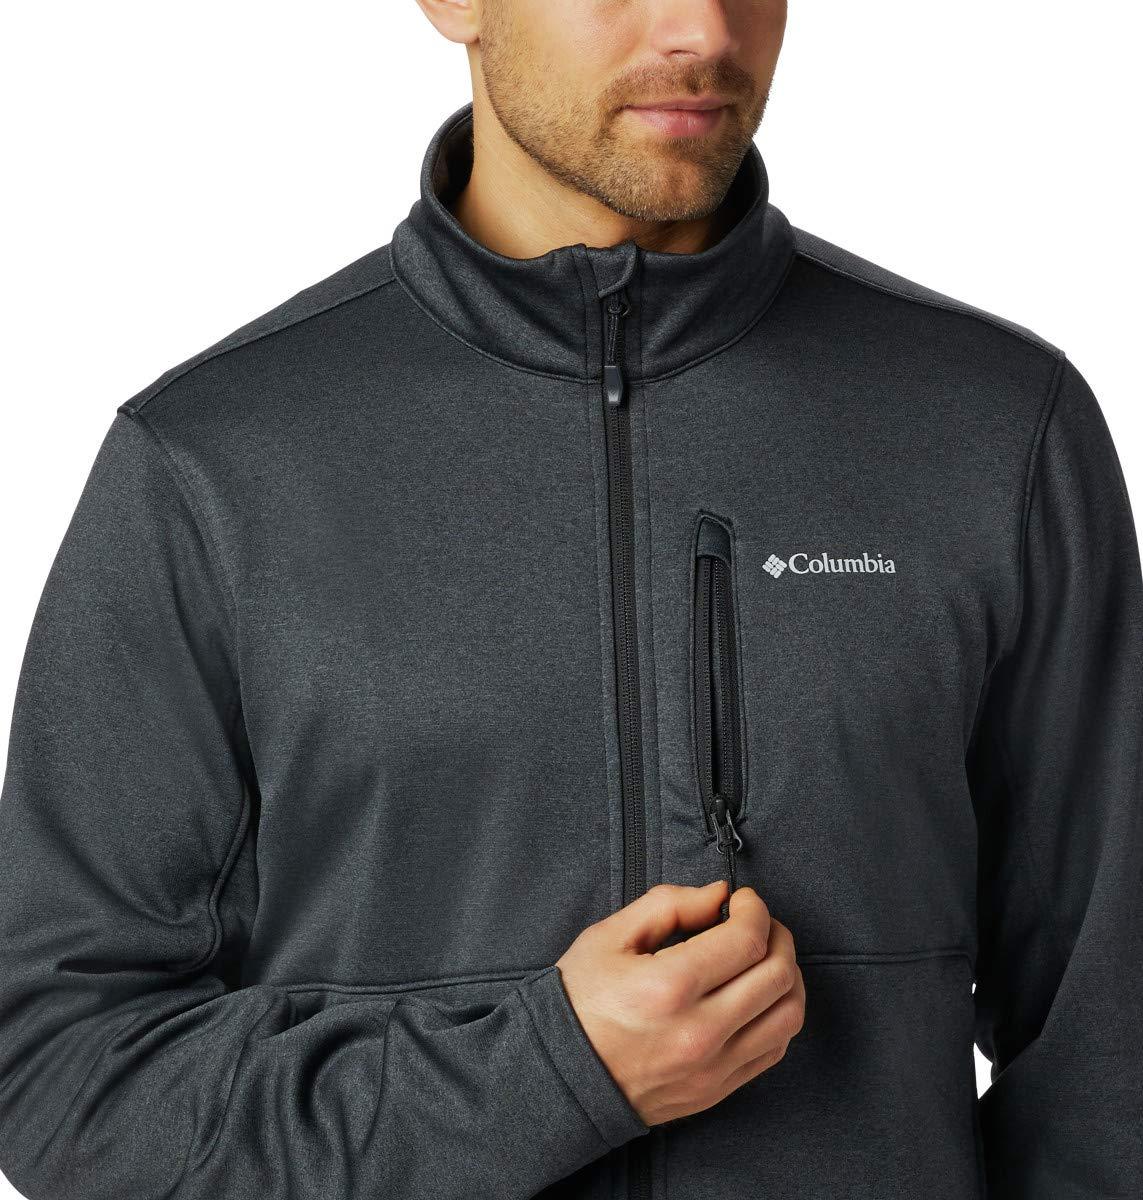 Columbia Herren Outdoor Elements Fleece-Jacke mit Durchgehendem Rei/ßverschluss